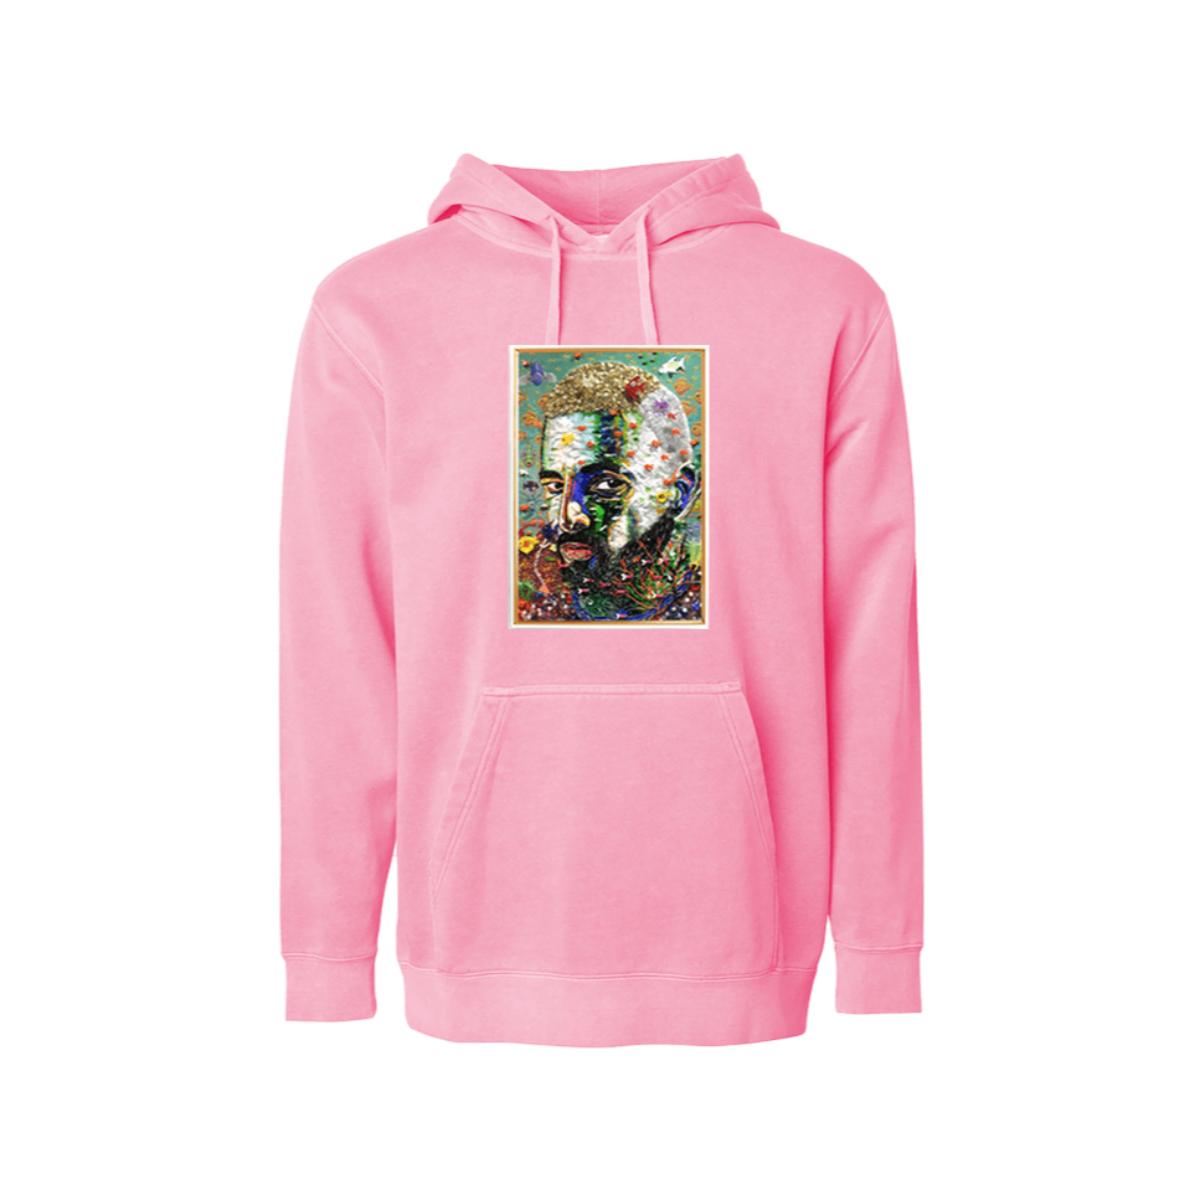 #7DJ Portrait Pink Hoodie